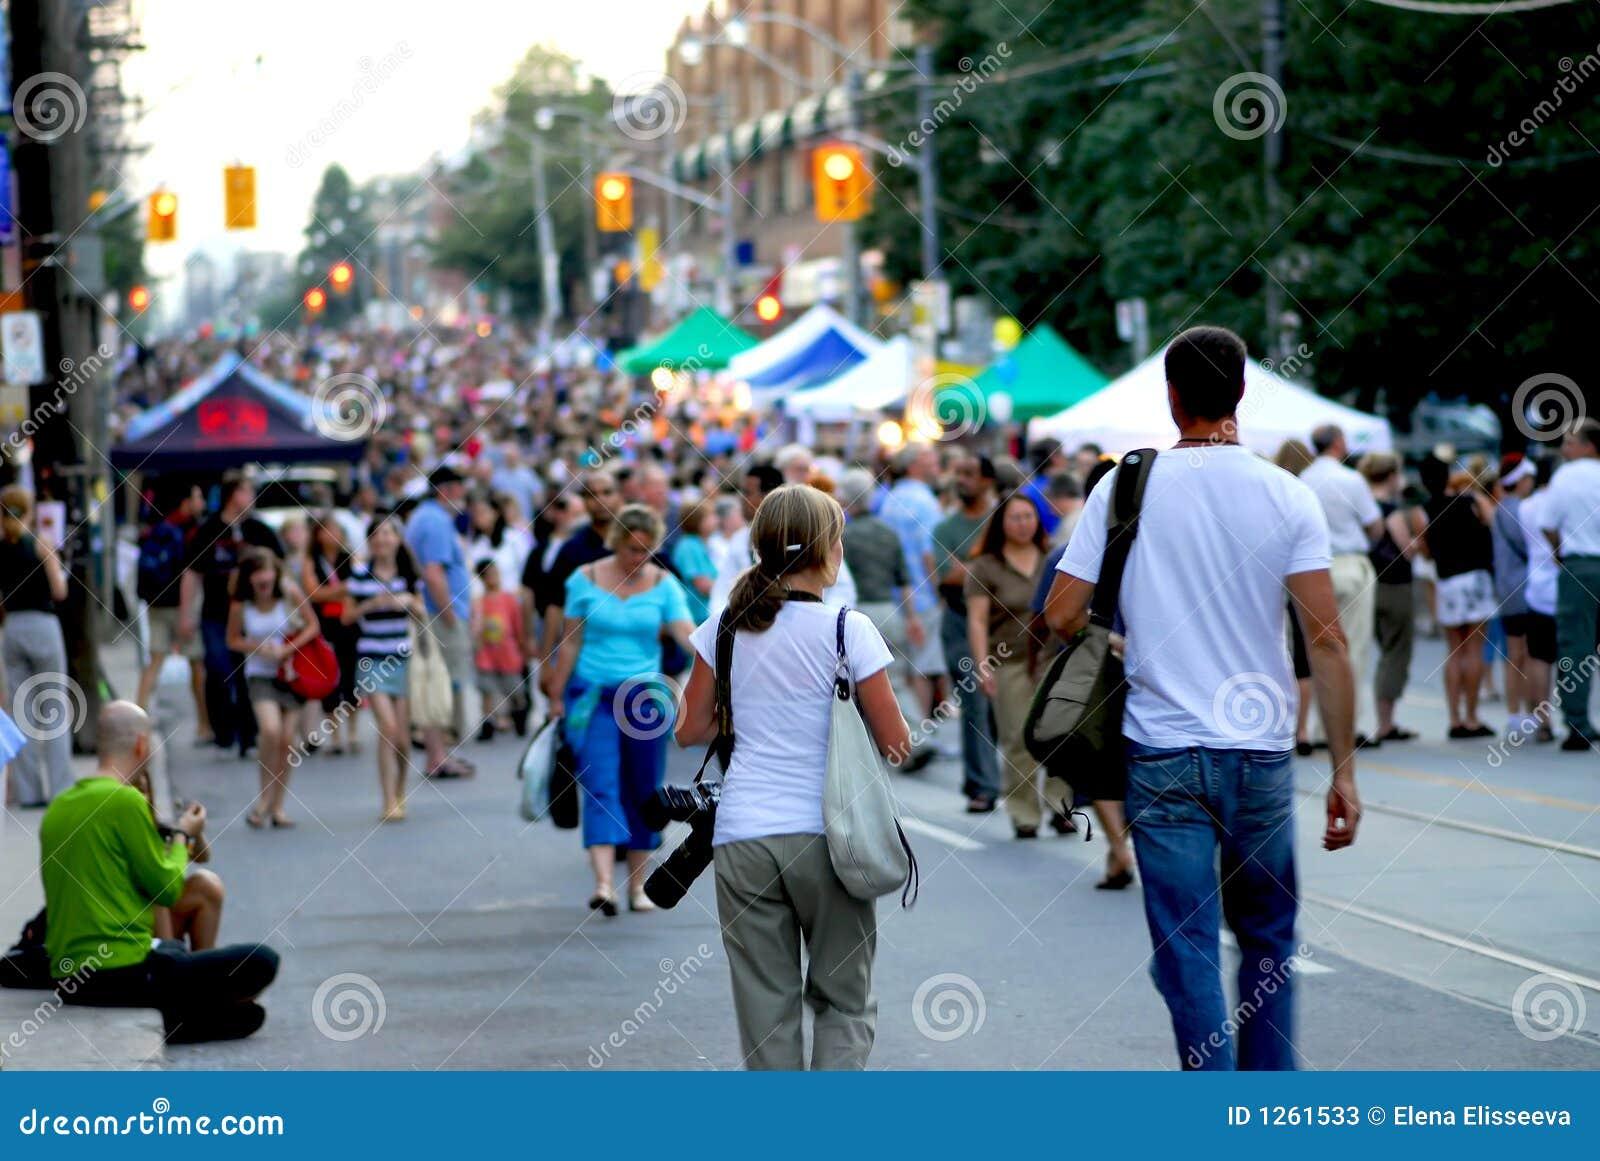 Festiwal street